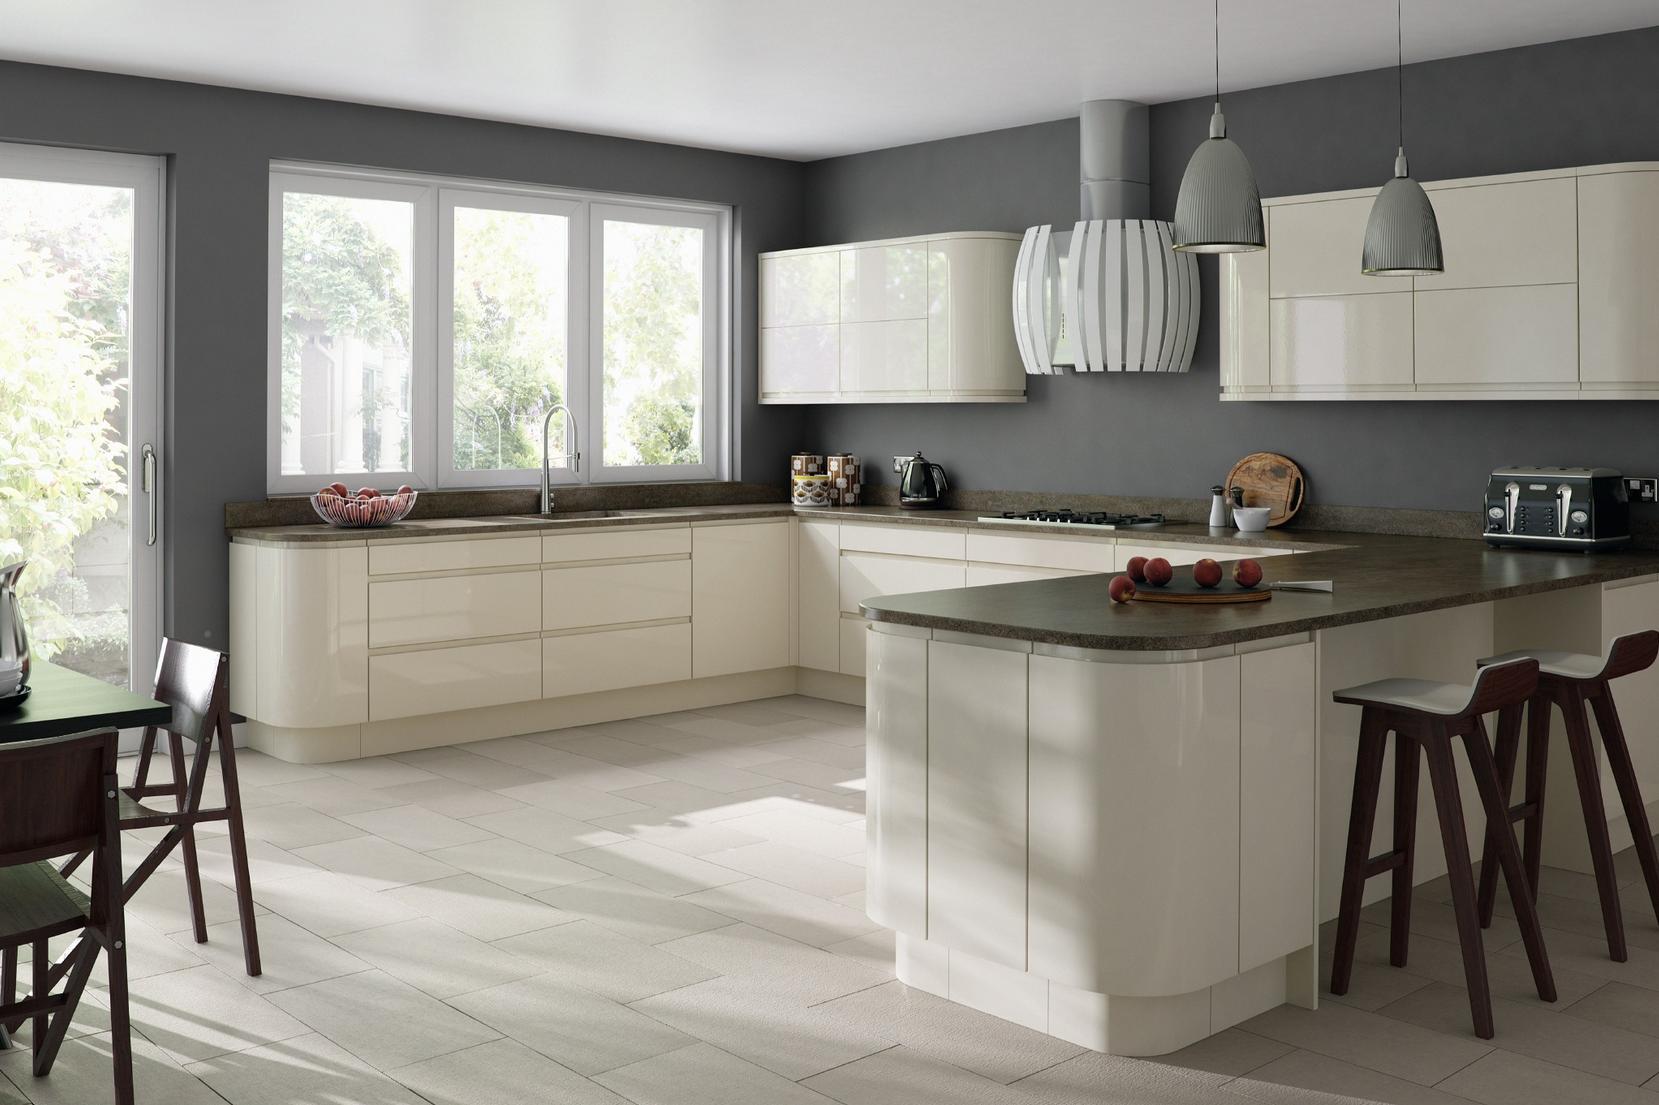 Glossy Cream Kitchen Cabinets Google Search Kitchen Remodel